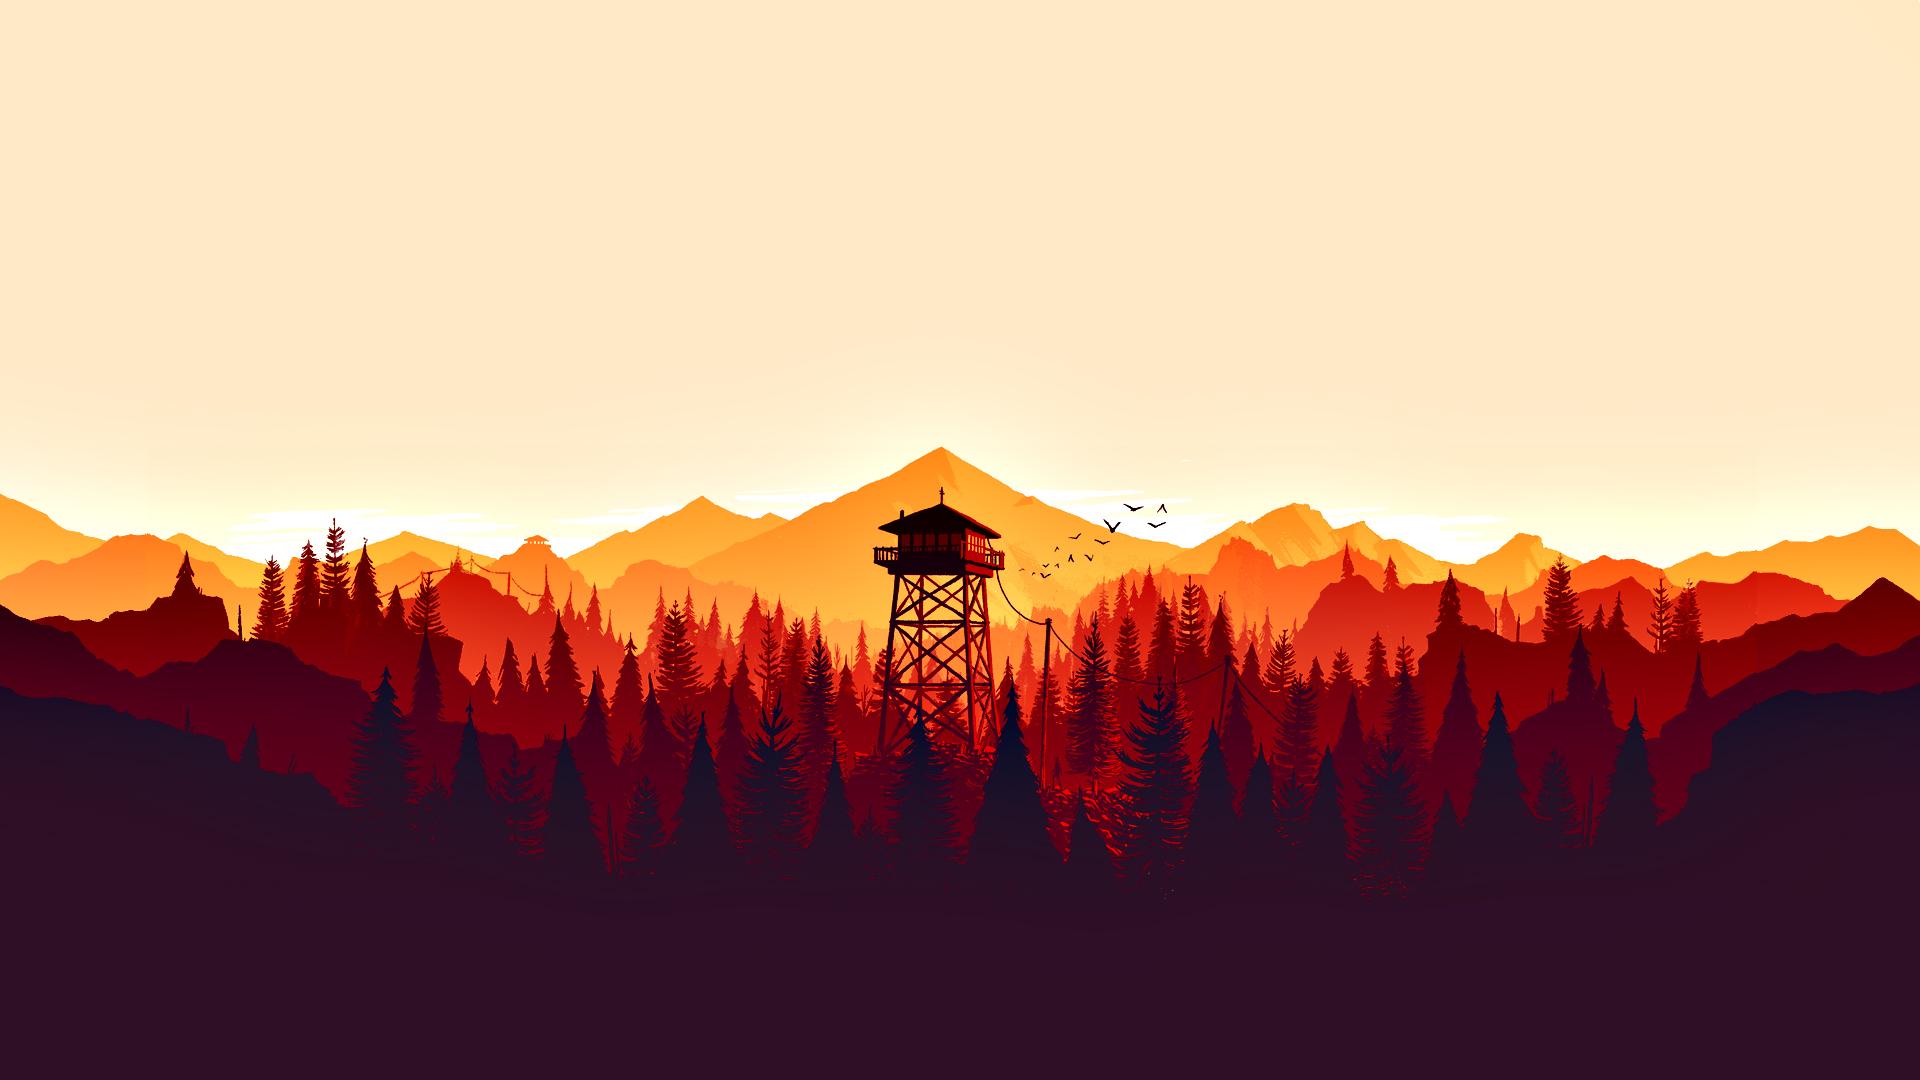 Firewatch Video Games Forest Fire Lookout Tower Minimalism Digital Art Colorful Lan Desktop Wallpaper Art Minimal Wallpaper Minimalist Wallpaper